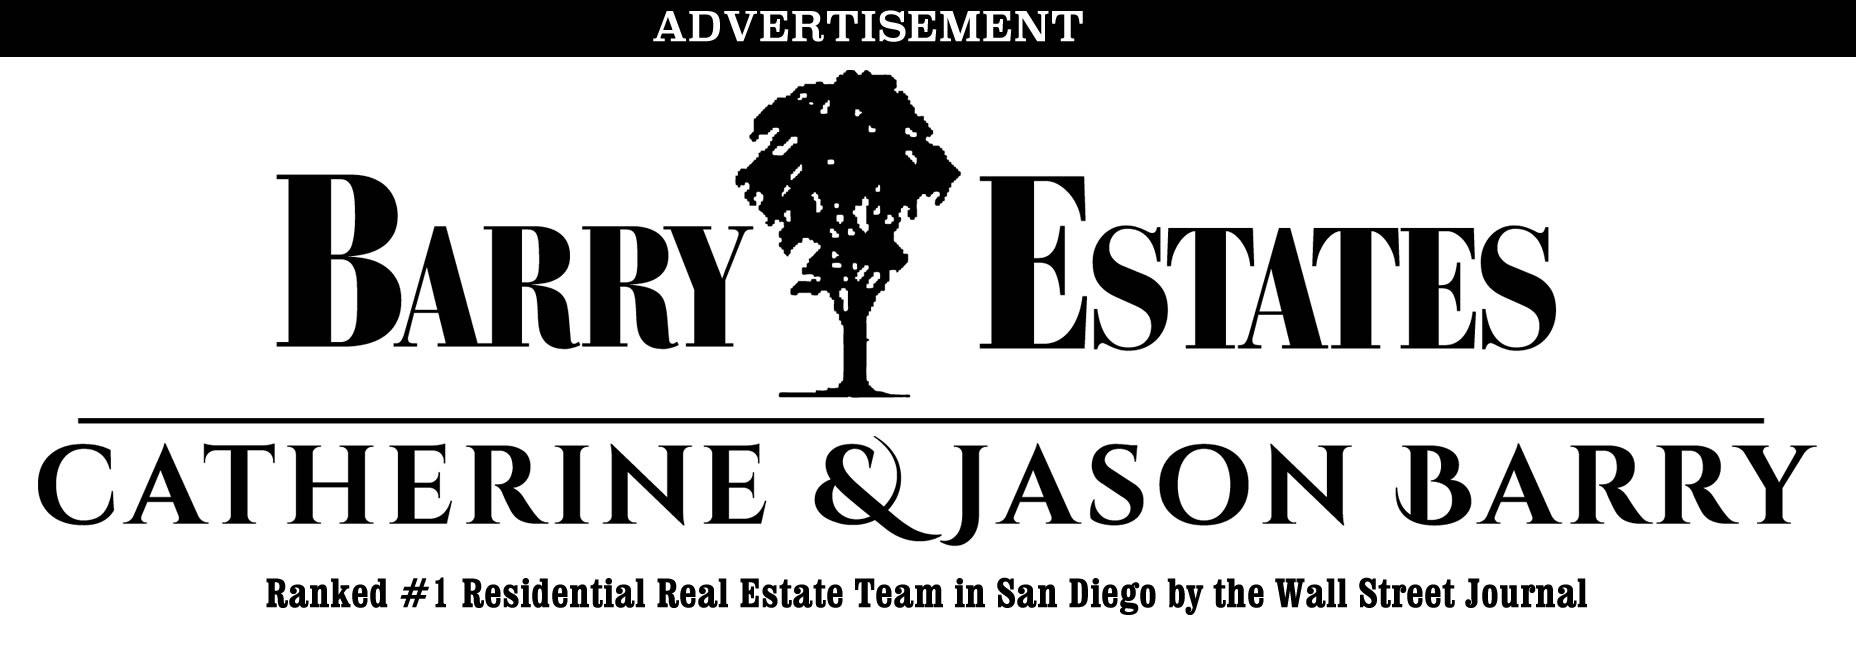 Barry Estate